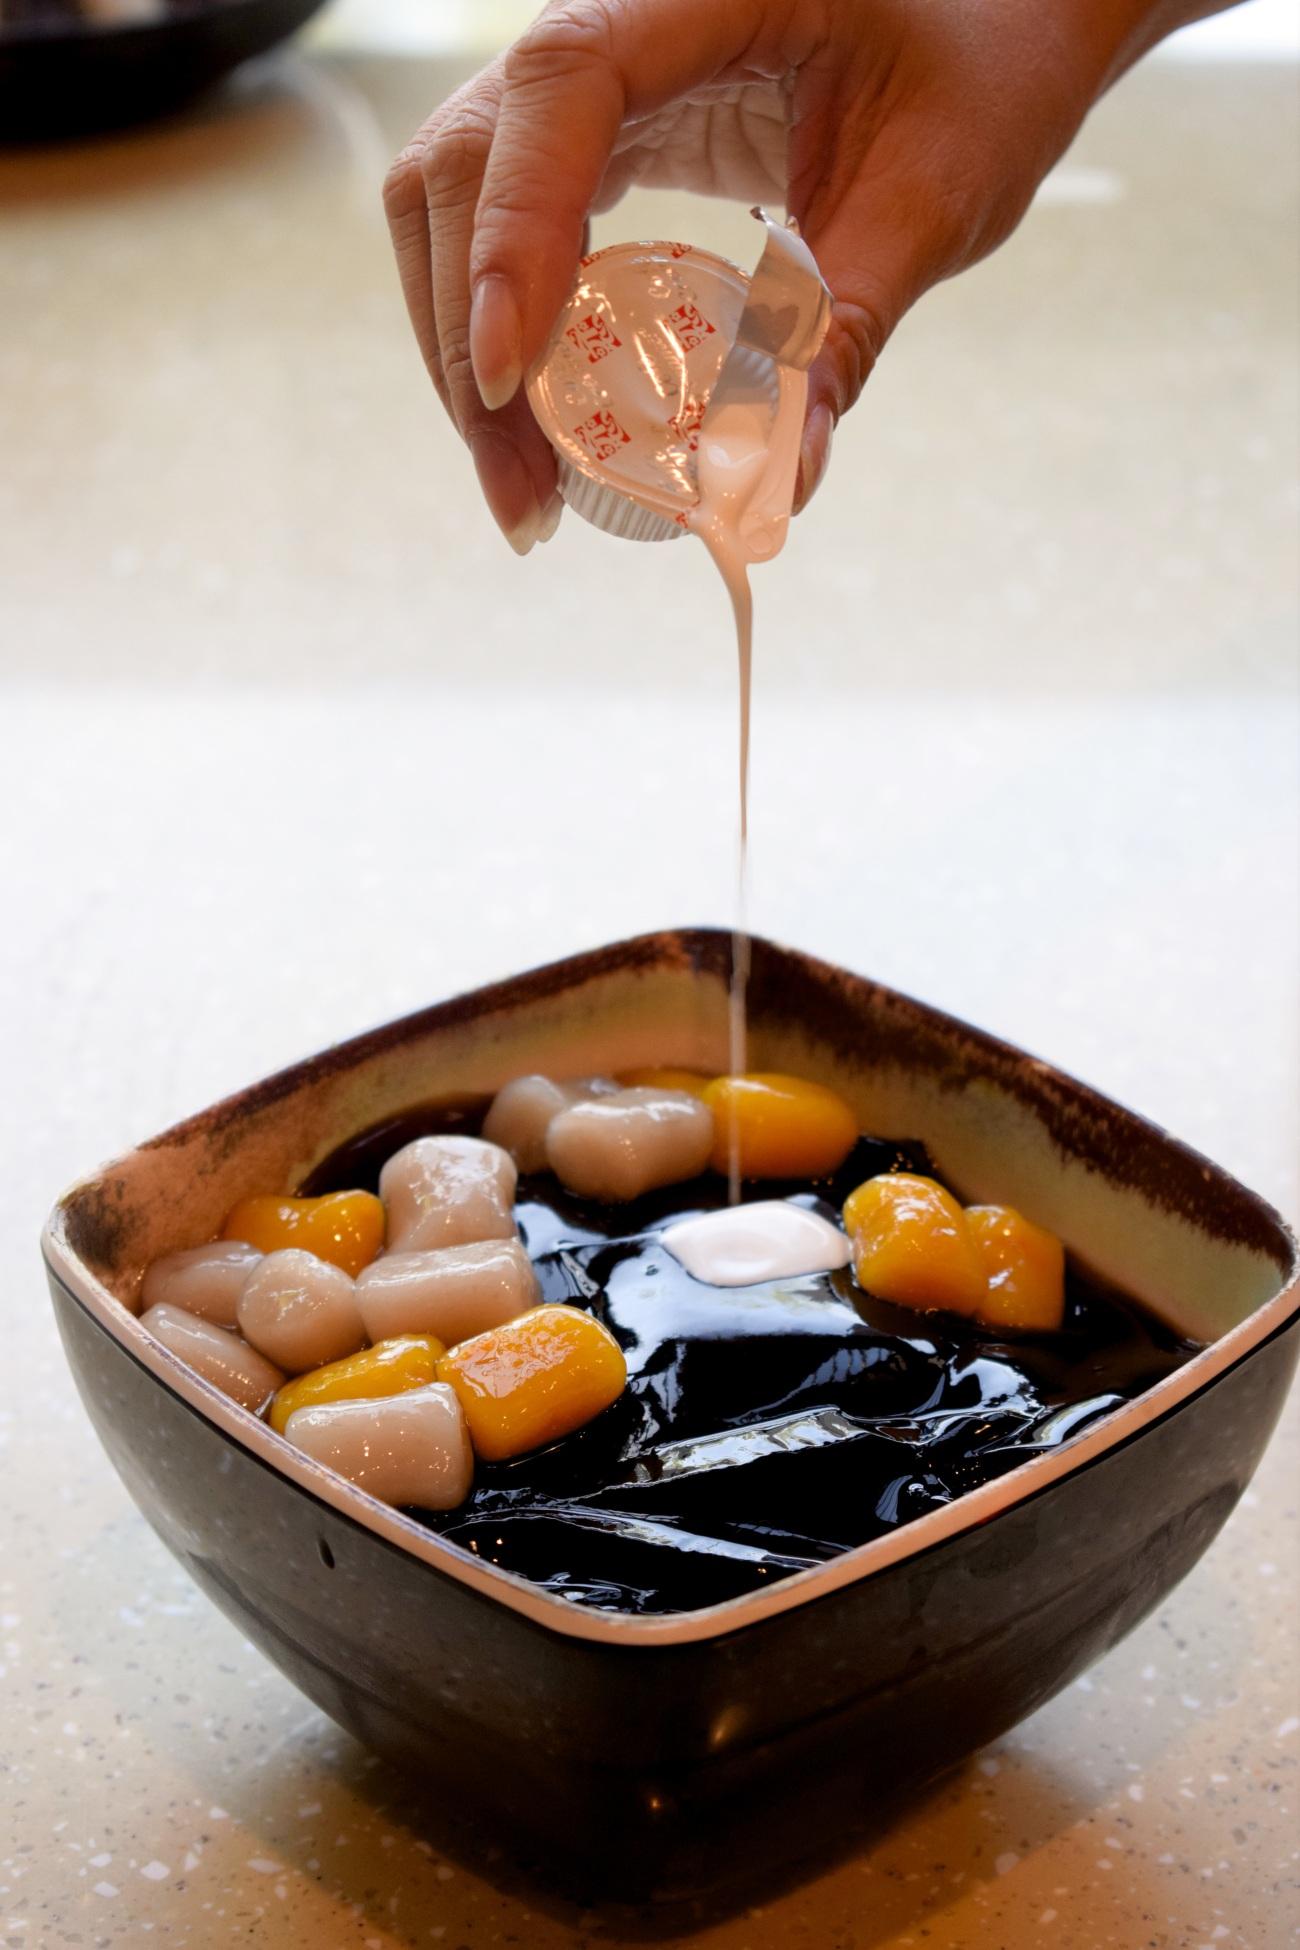 meet-fresh-taiwanese-dessert-626-rowland-hacienda-heights-taiwan-ocfoodfiend-oc-food-fiend-irvine-grass-jelly-new-blogger-where-to-get.JPG